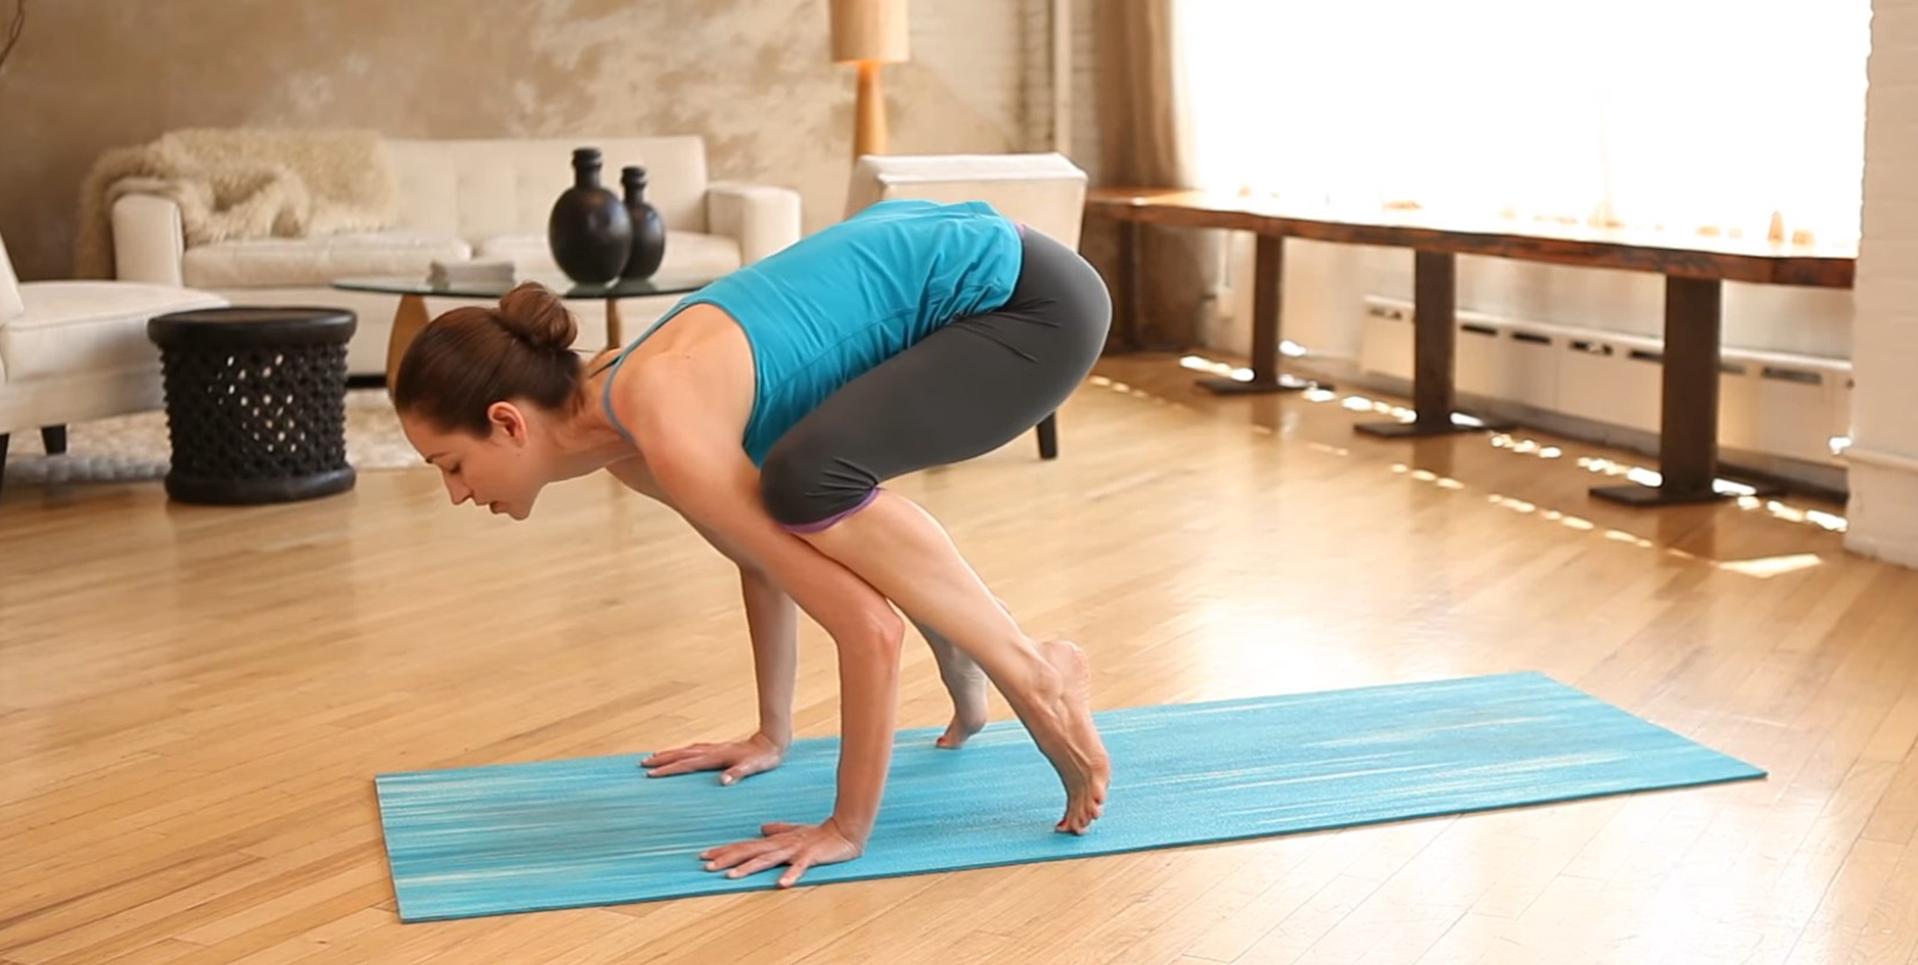 Hard Poses Made Easy | Intermediate Yoga with Tara Stiles